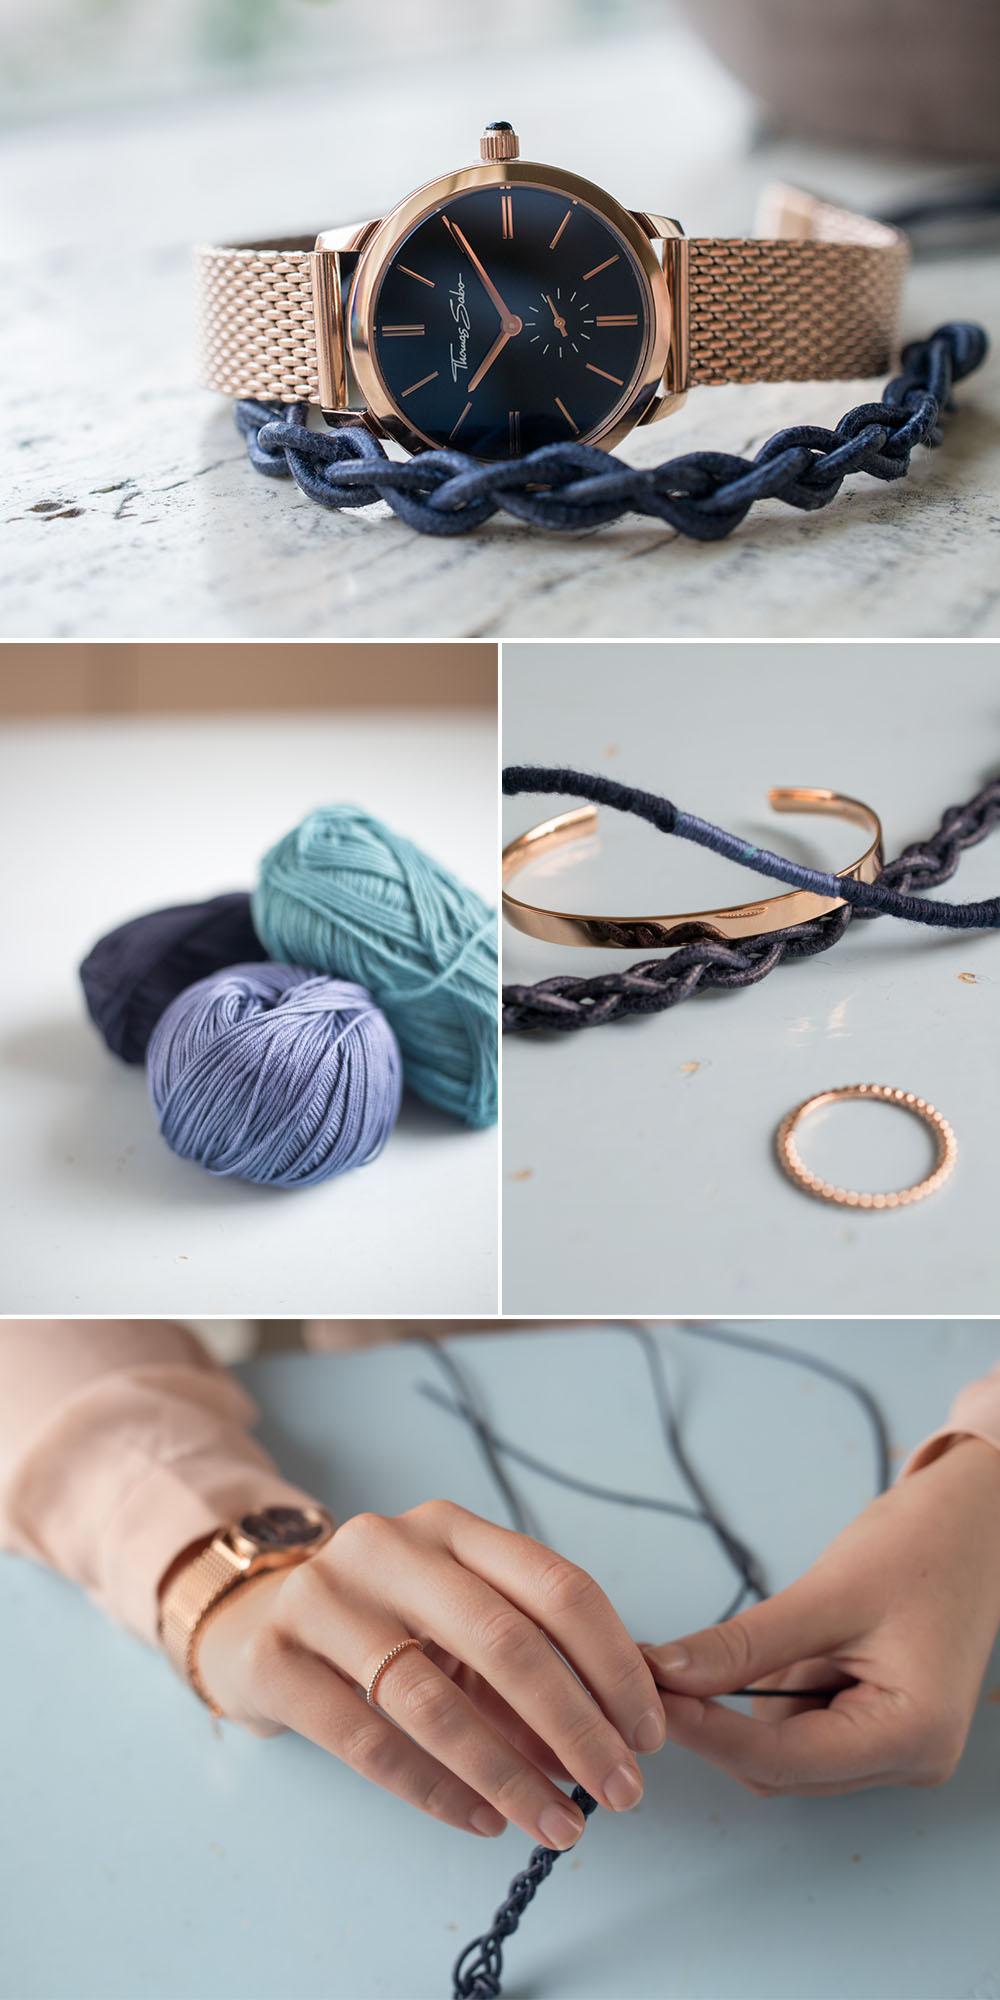 Anleitung für 3 DIY Armbänder